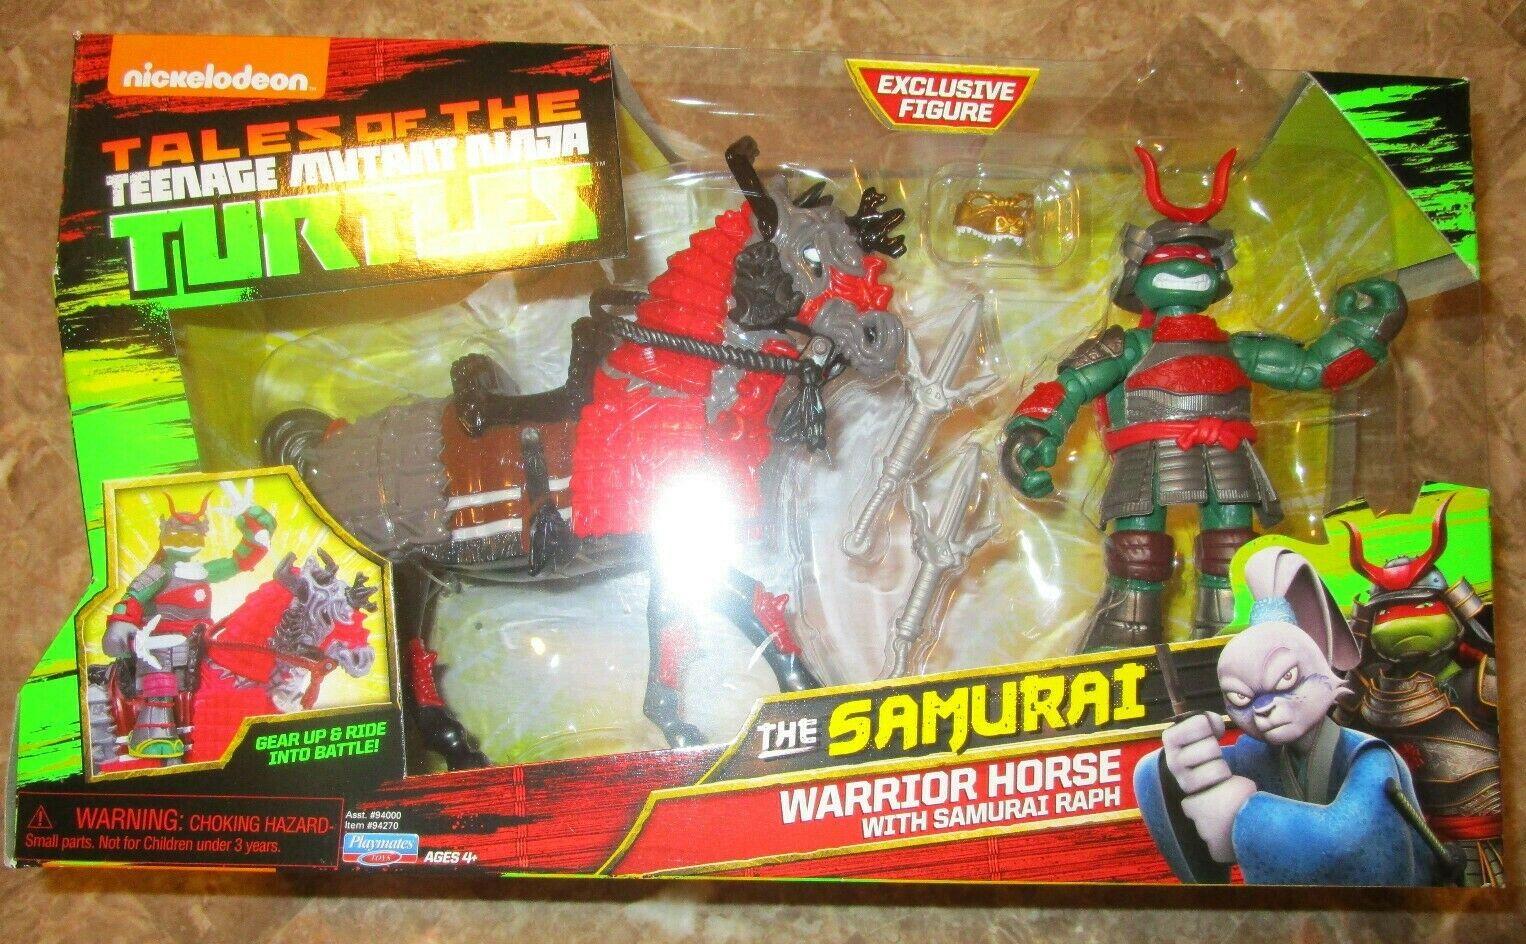 Tales of The Teenage Mutant Ninja Turtles SAMURAI WARRIOR HORSE RAPH cifra SET